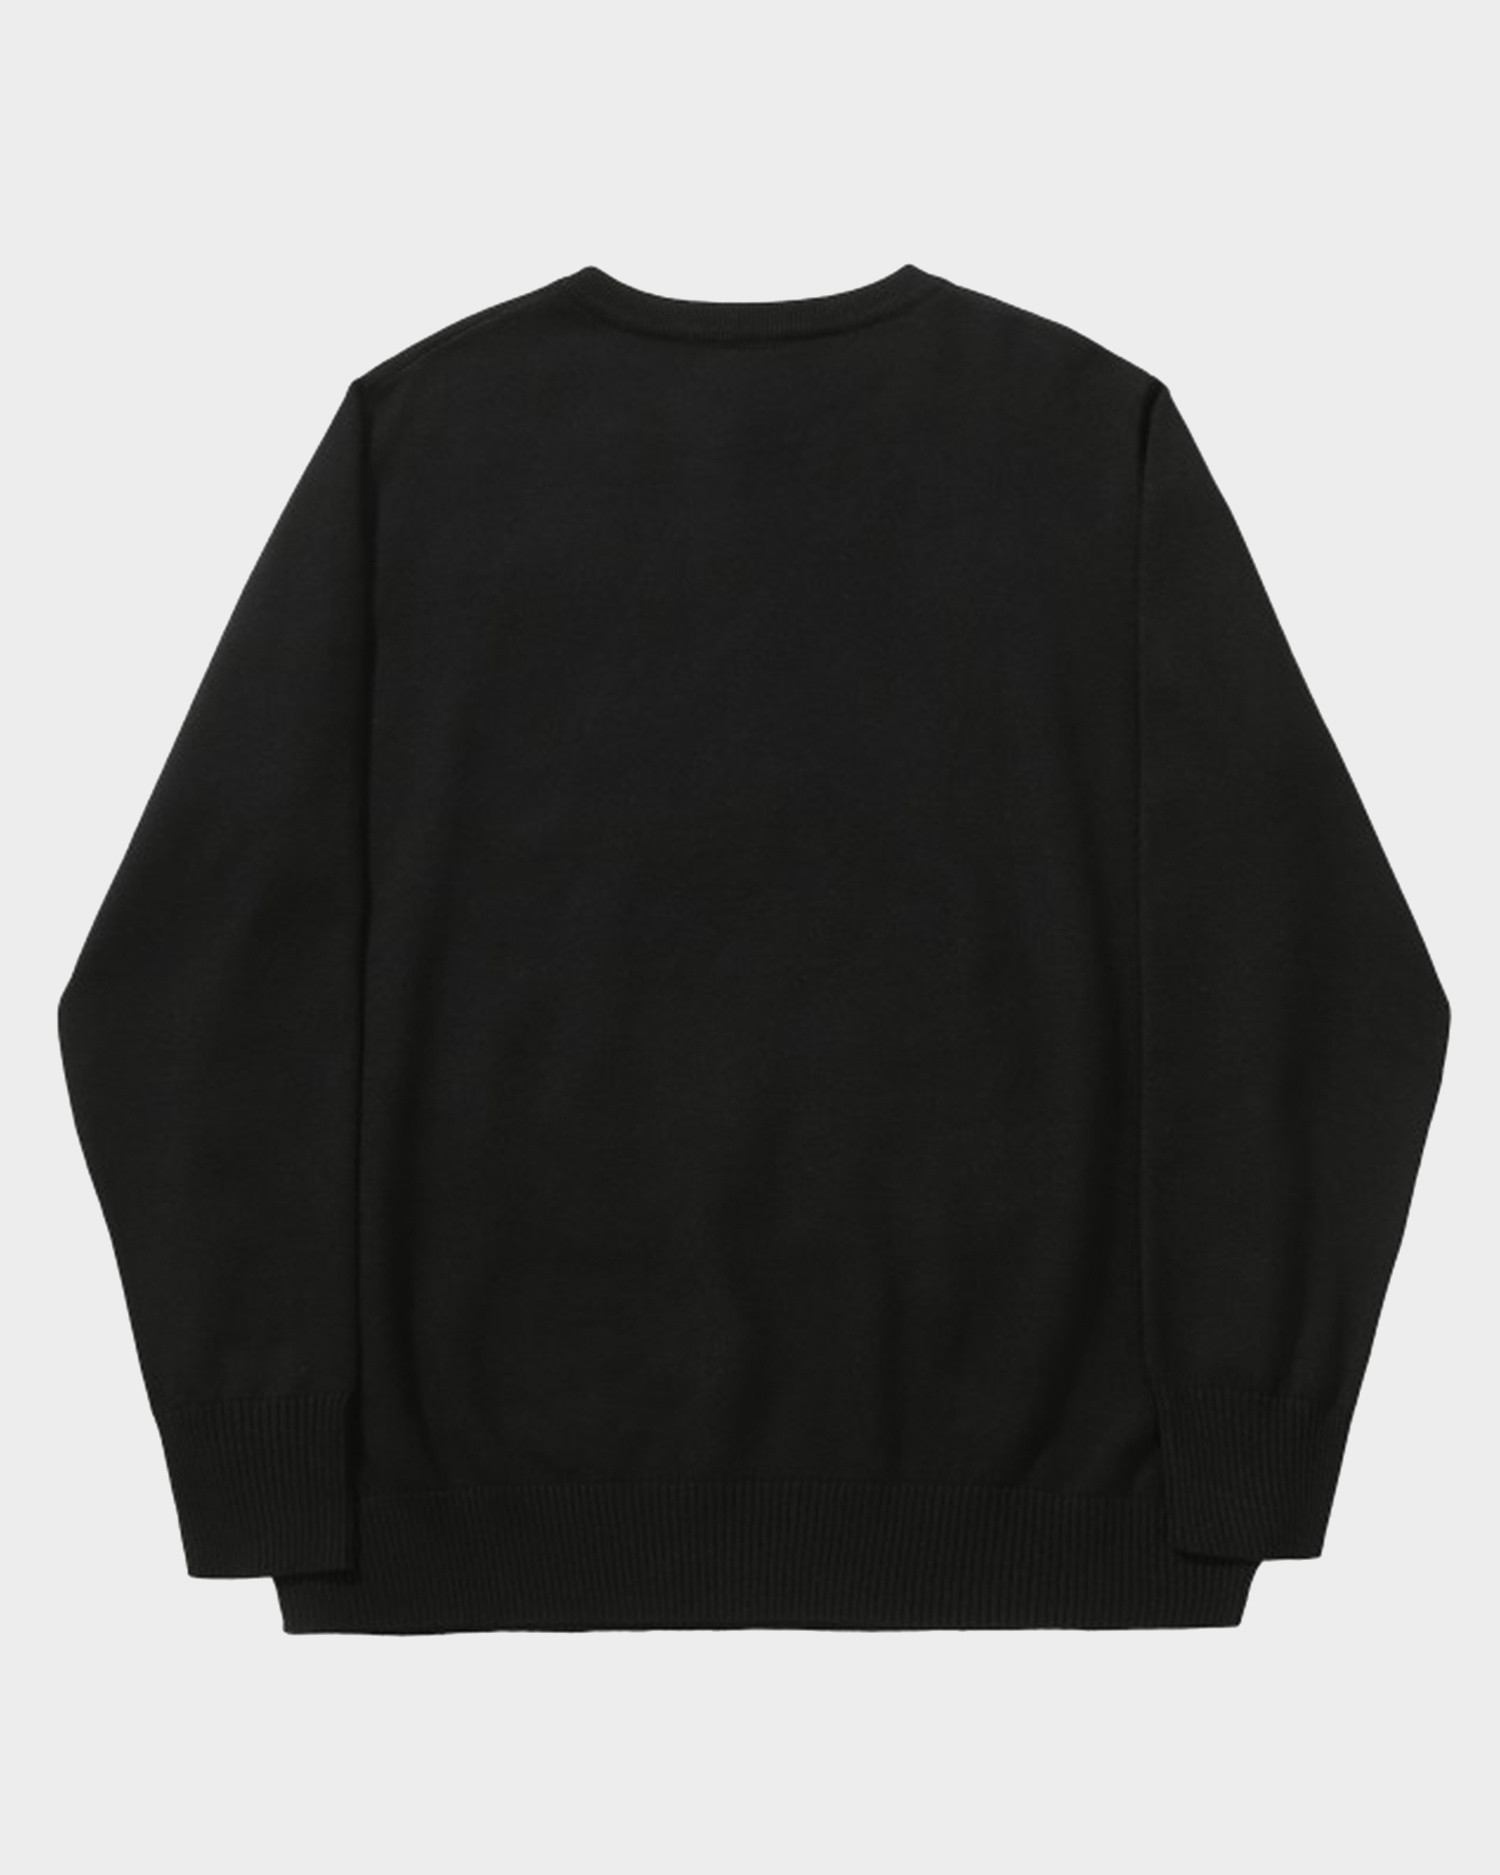 Helas United Knit Sweater Black